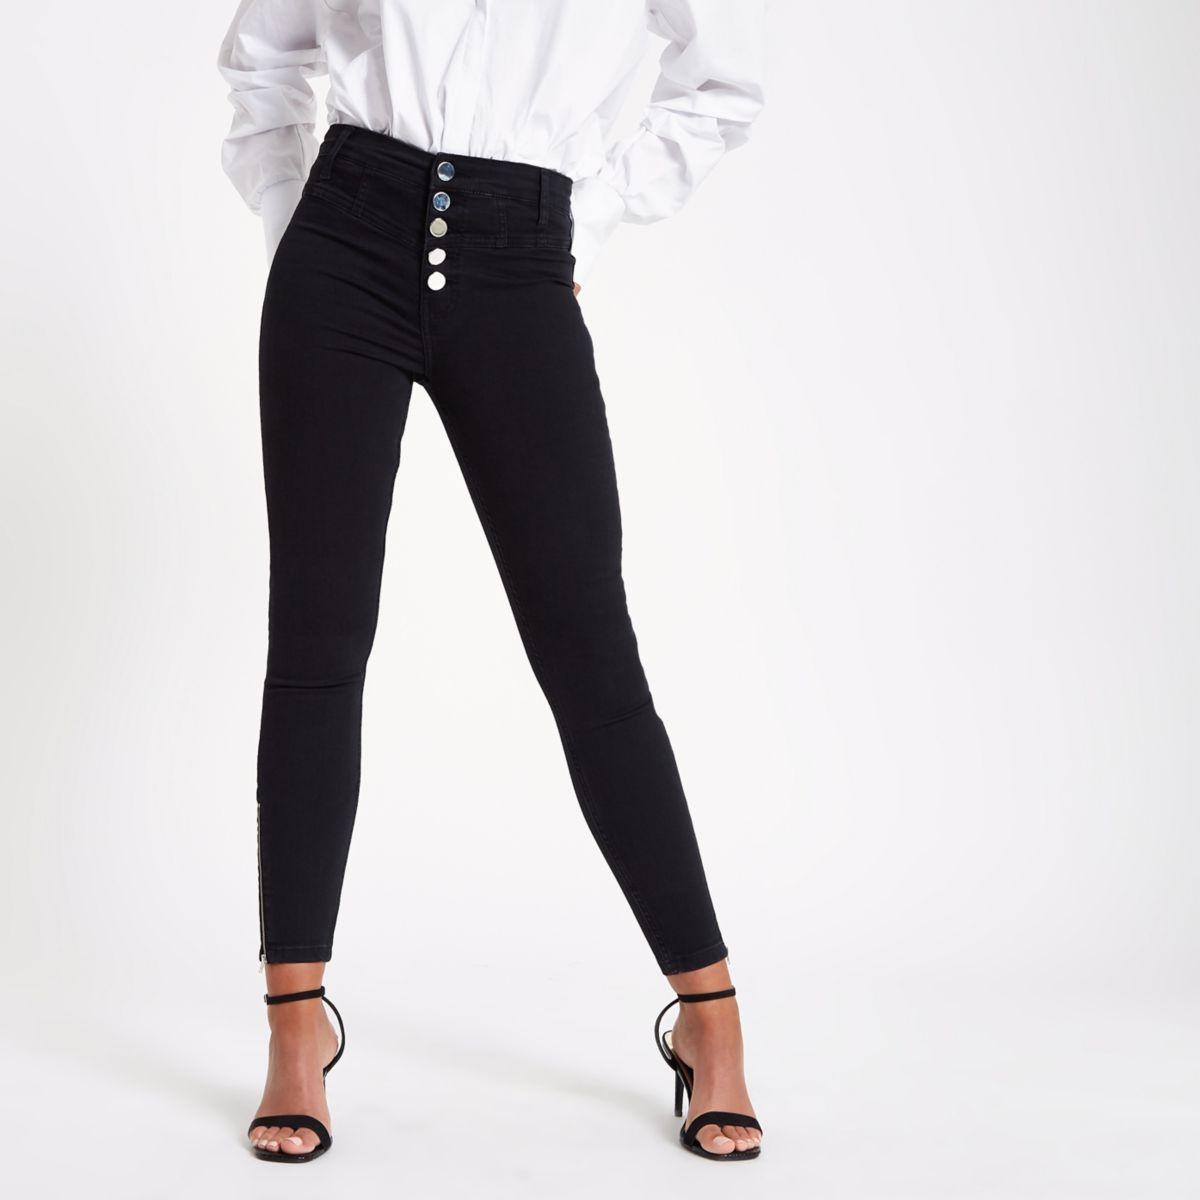 Harper - Zwarte superskinny jeans met hoge taille